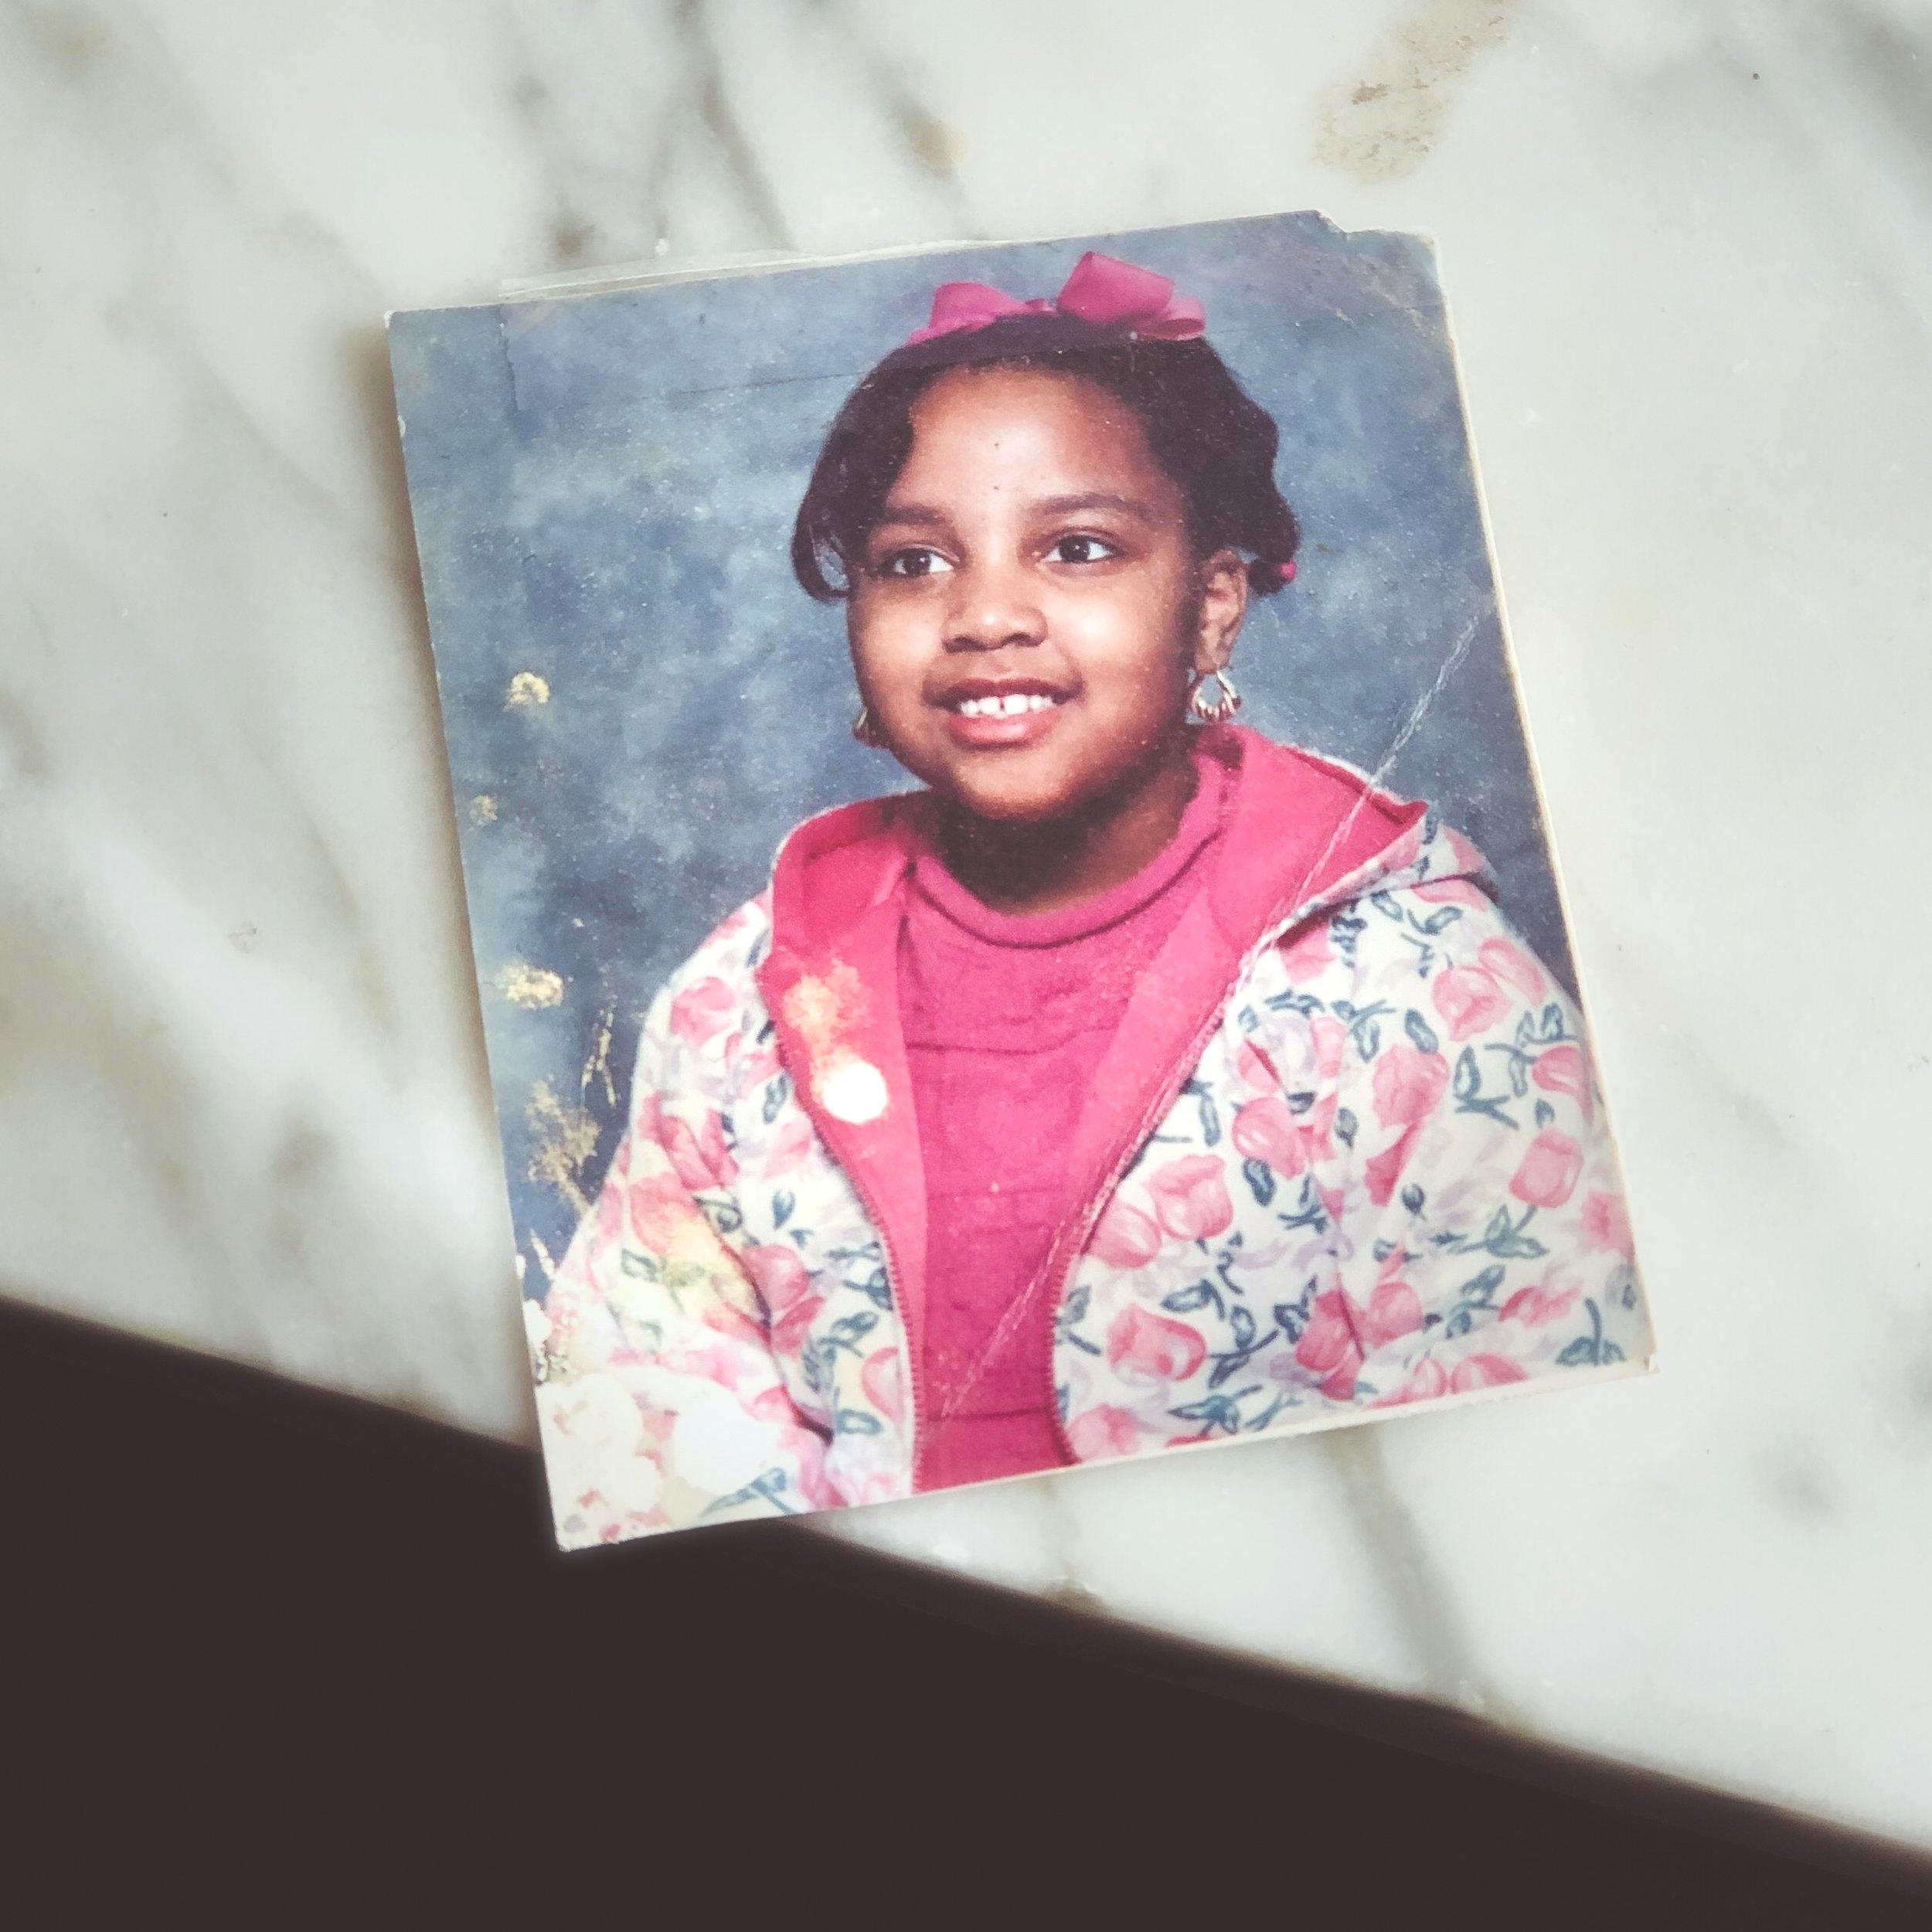 Amber, age 7